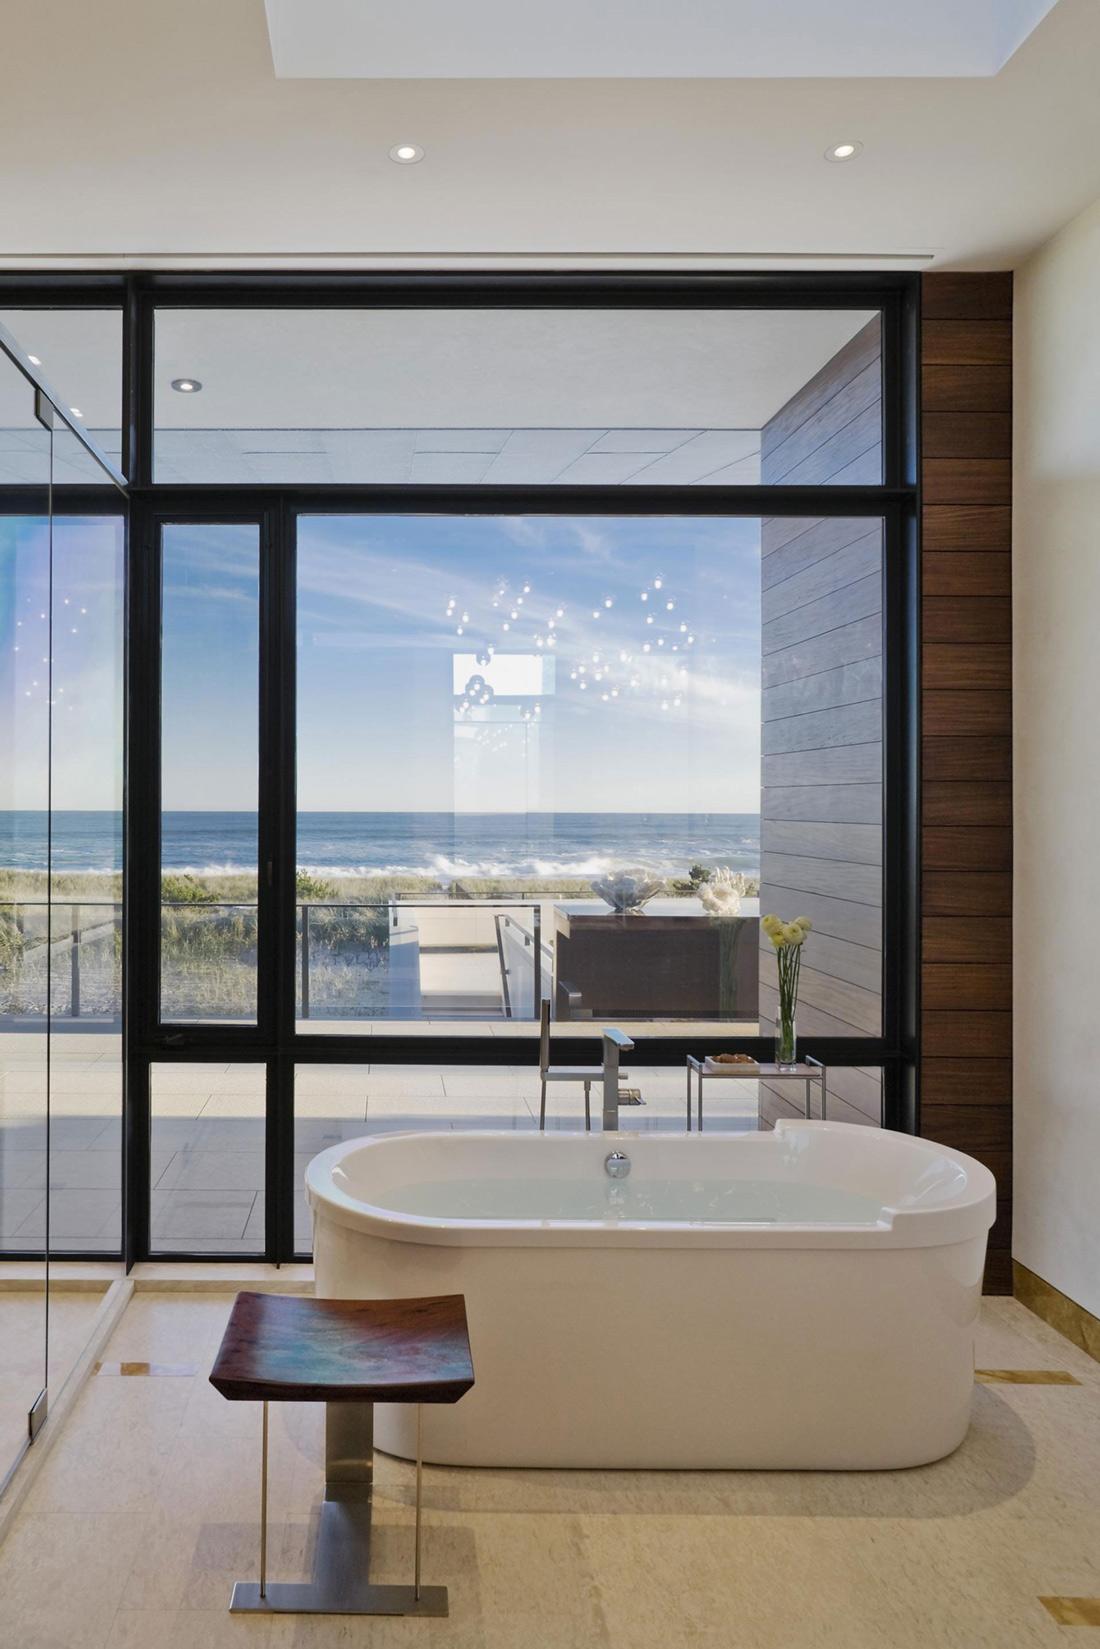 Bathroom Tub Floor To Ceiling Windows Summer Retreat In